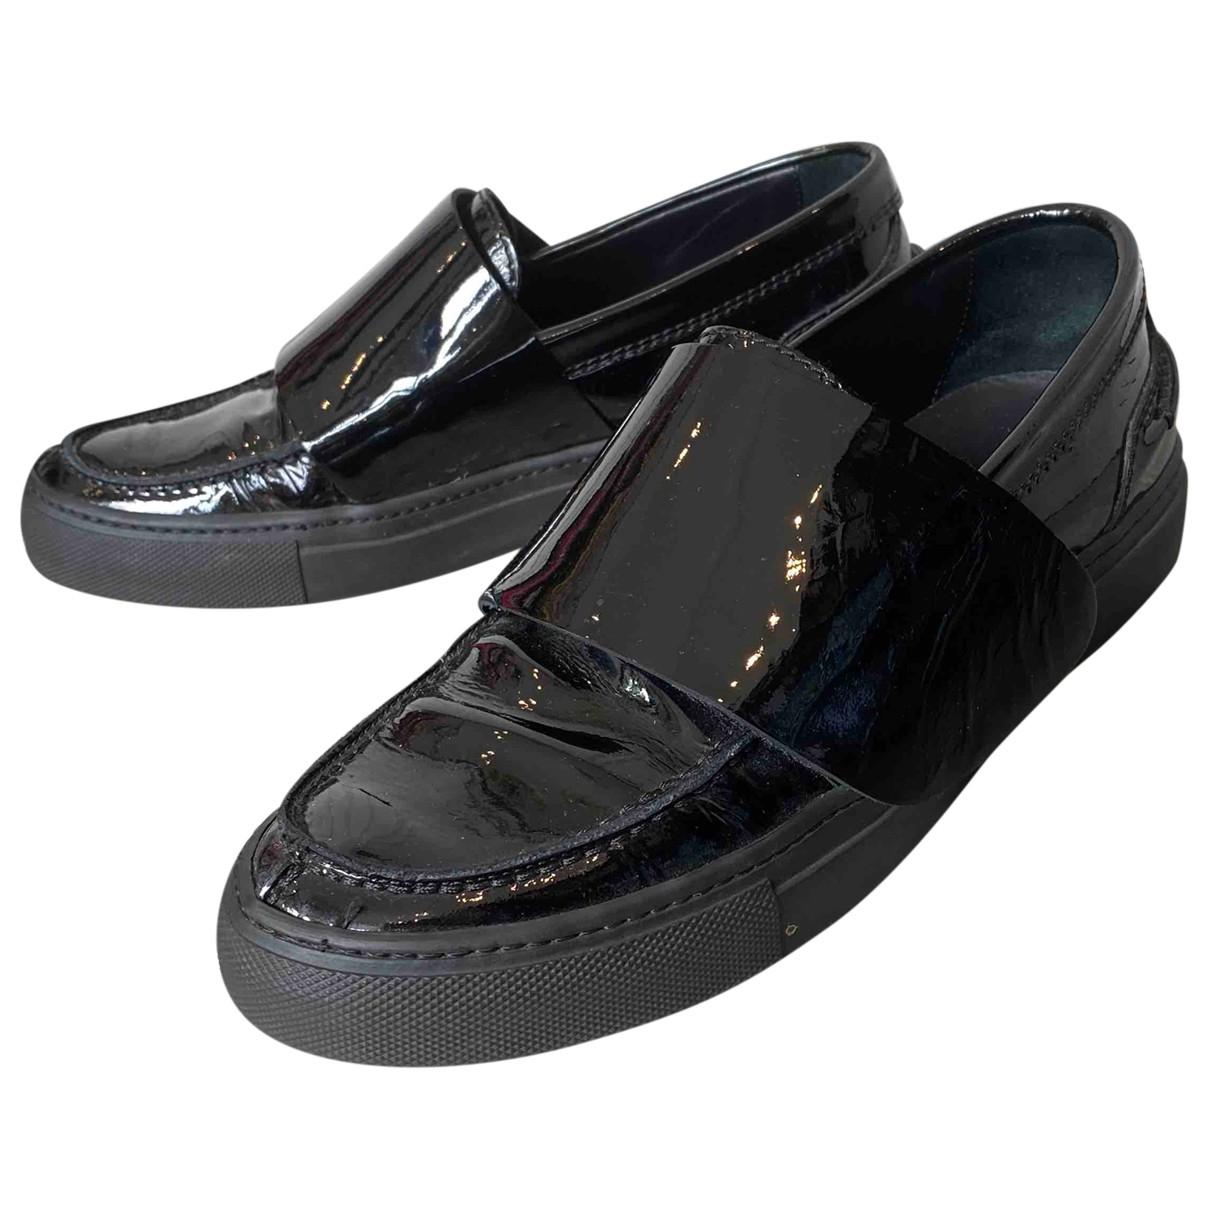 Giambattista Valli \N Black Patent leather Trainers for Women 39 EU